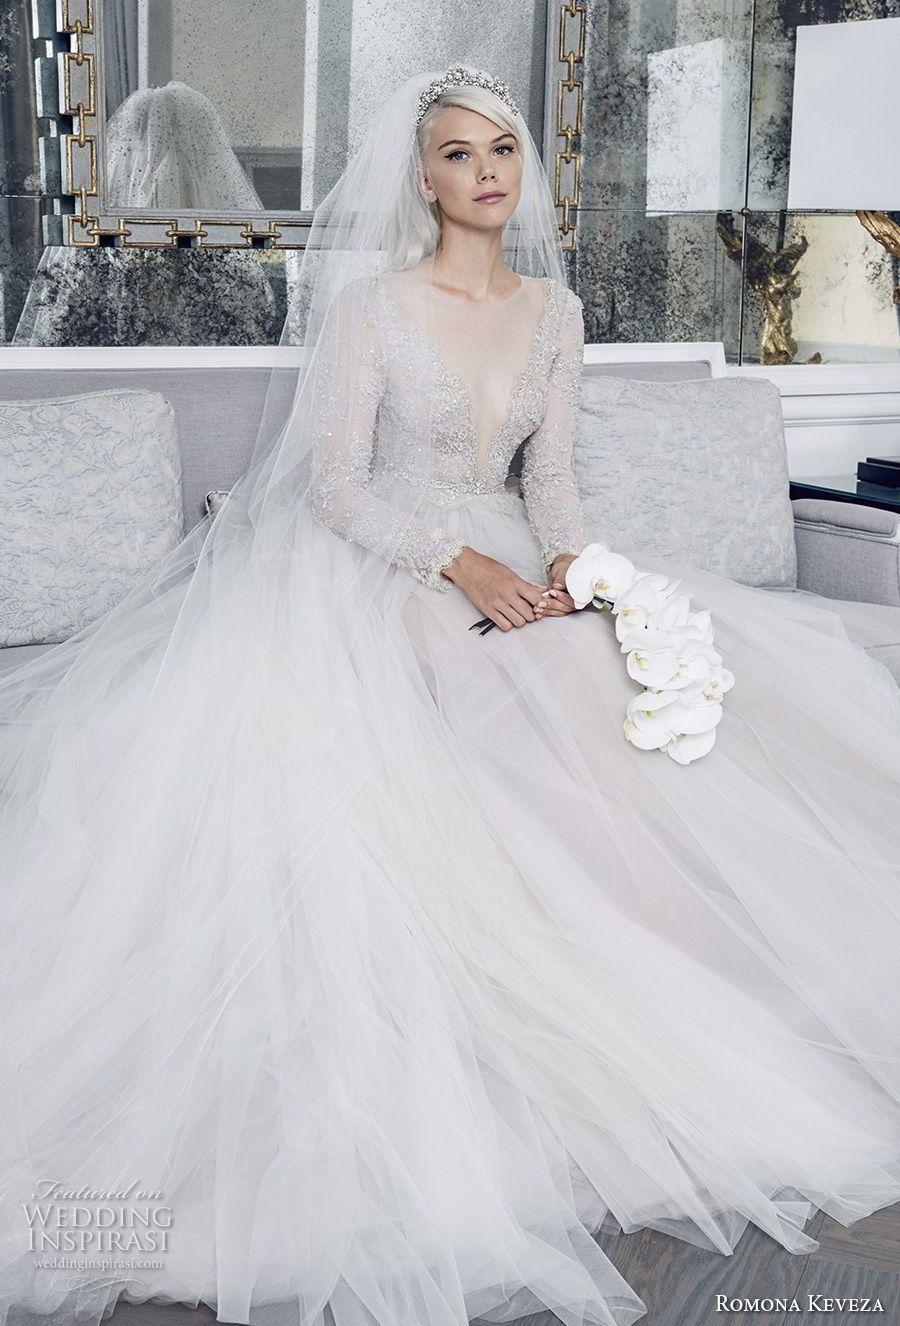 Tulle skirt wedding dress  Romona Keveza Collection Bridal Fall  Wedding Dresses  Gelinlik